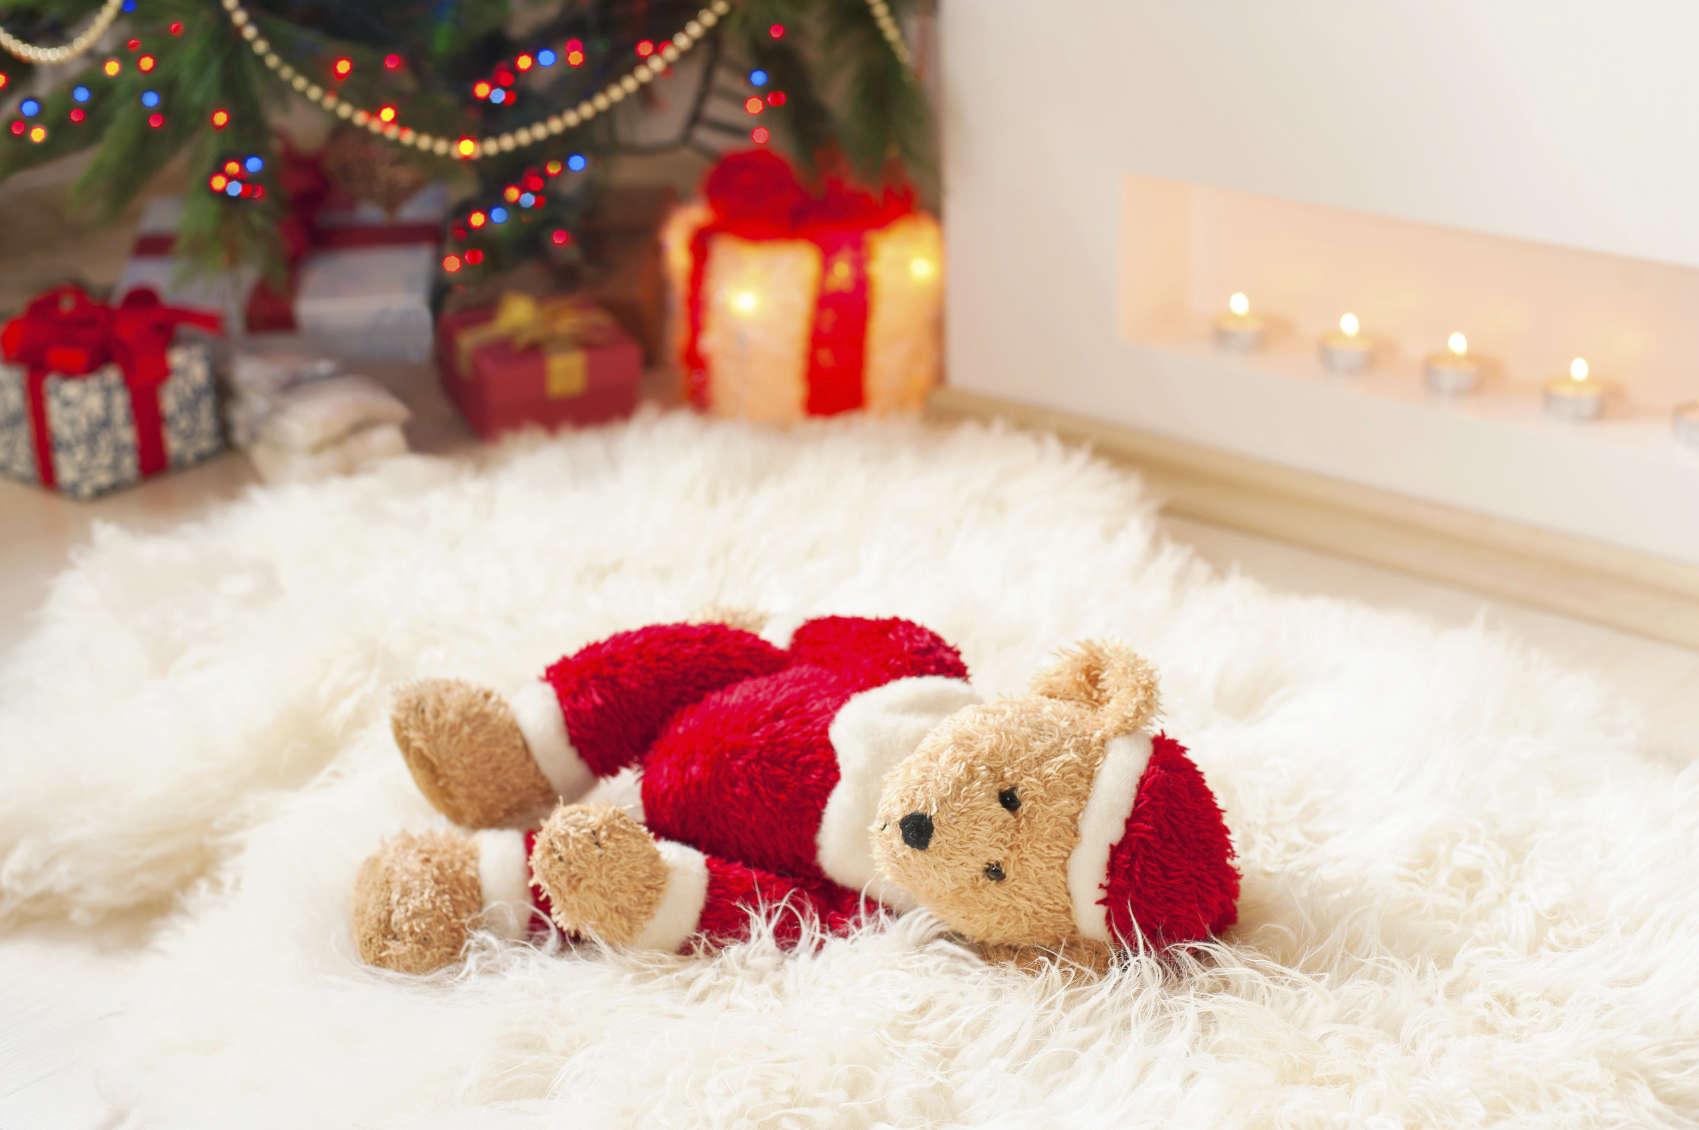 A Forgotten gift. Santa Teddy